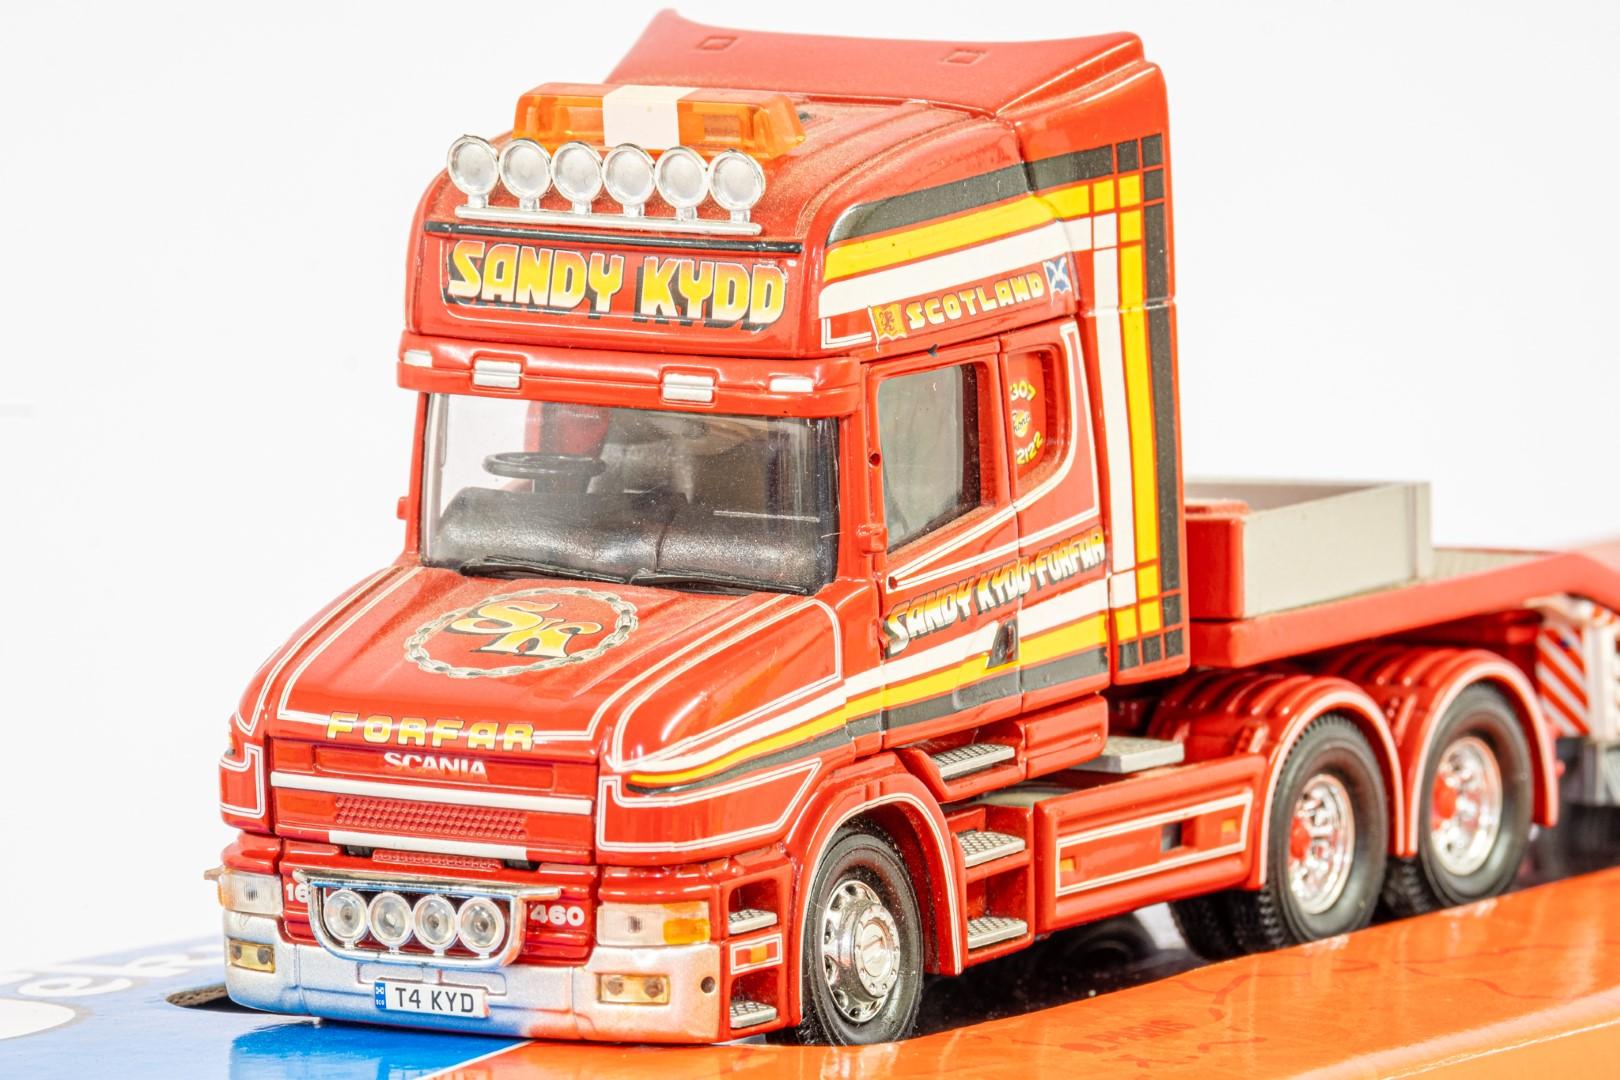 Corgi Scania 3-Series Low Loader Trailer - Sandy Kydd - In Tekno Box - Lion Toys Trailer - Image 4 of 5